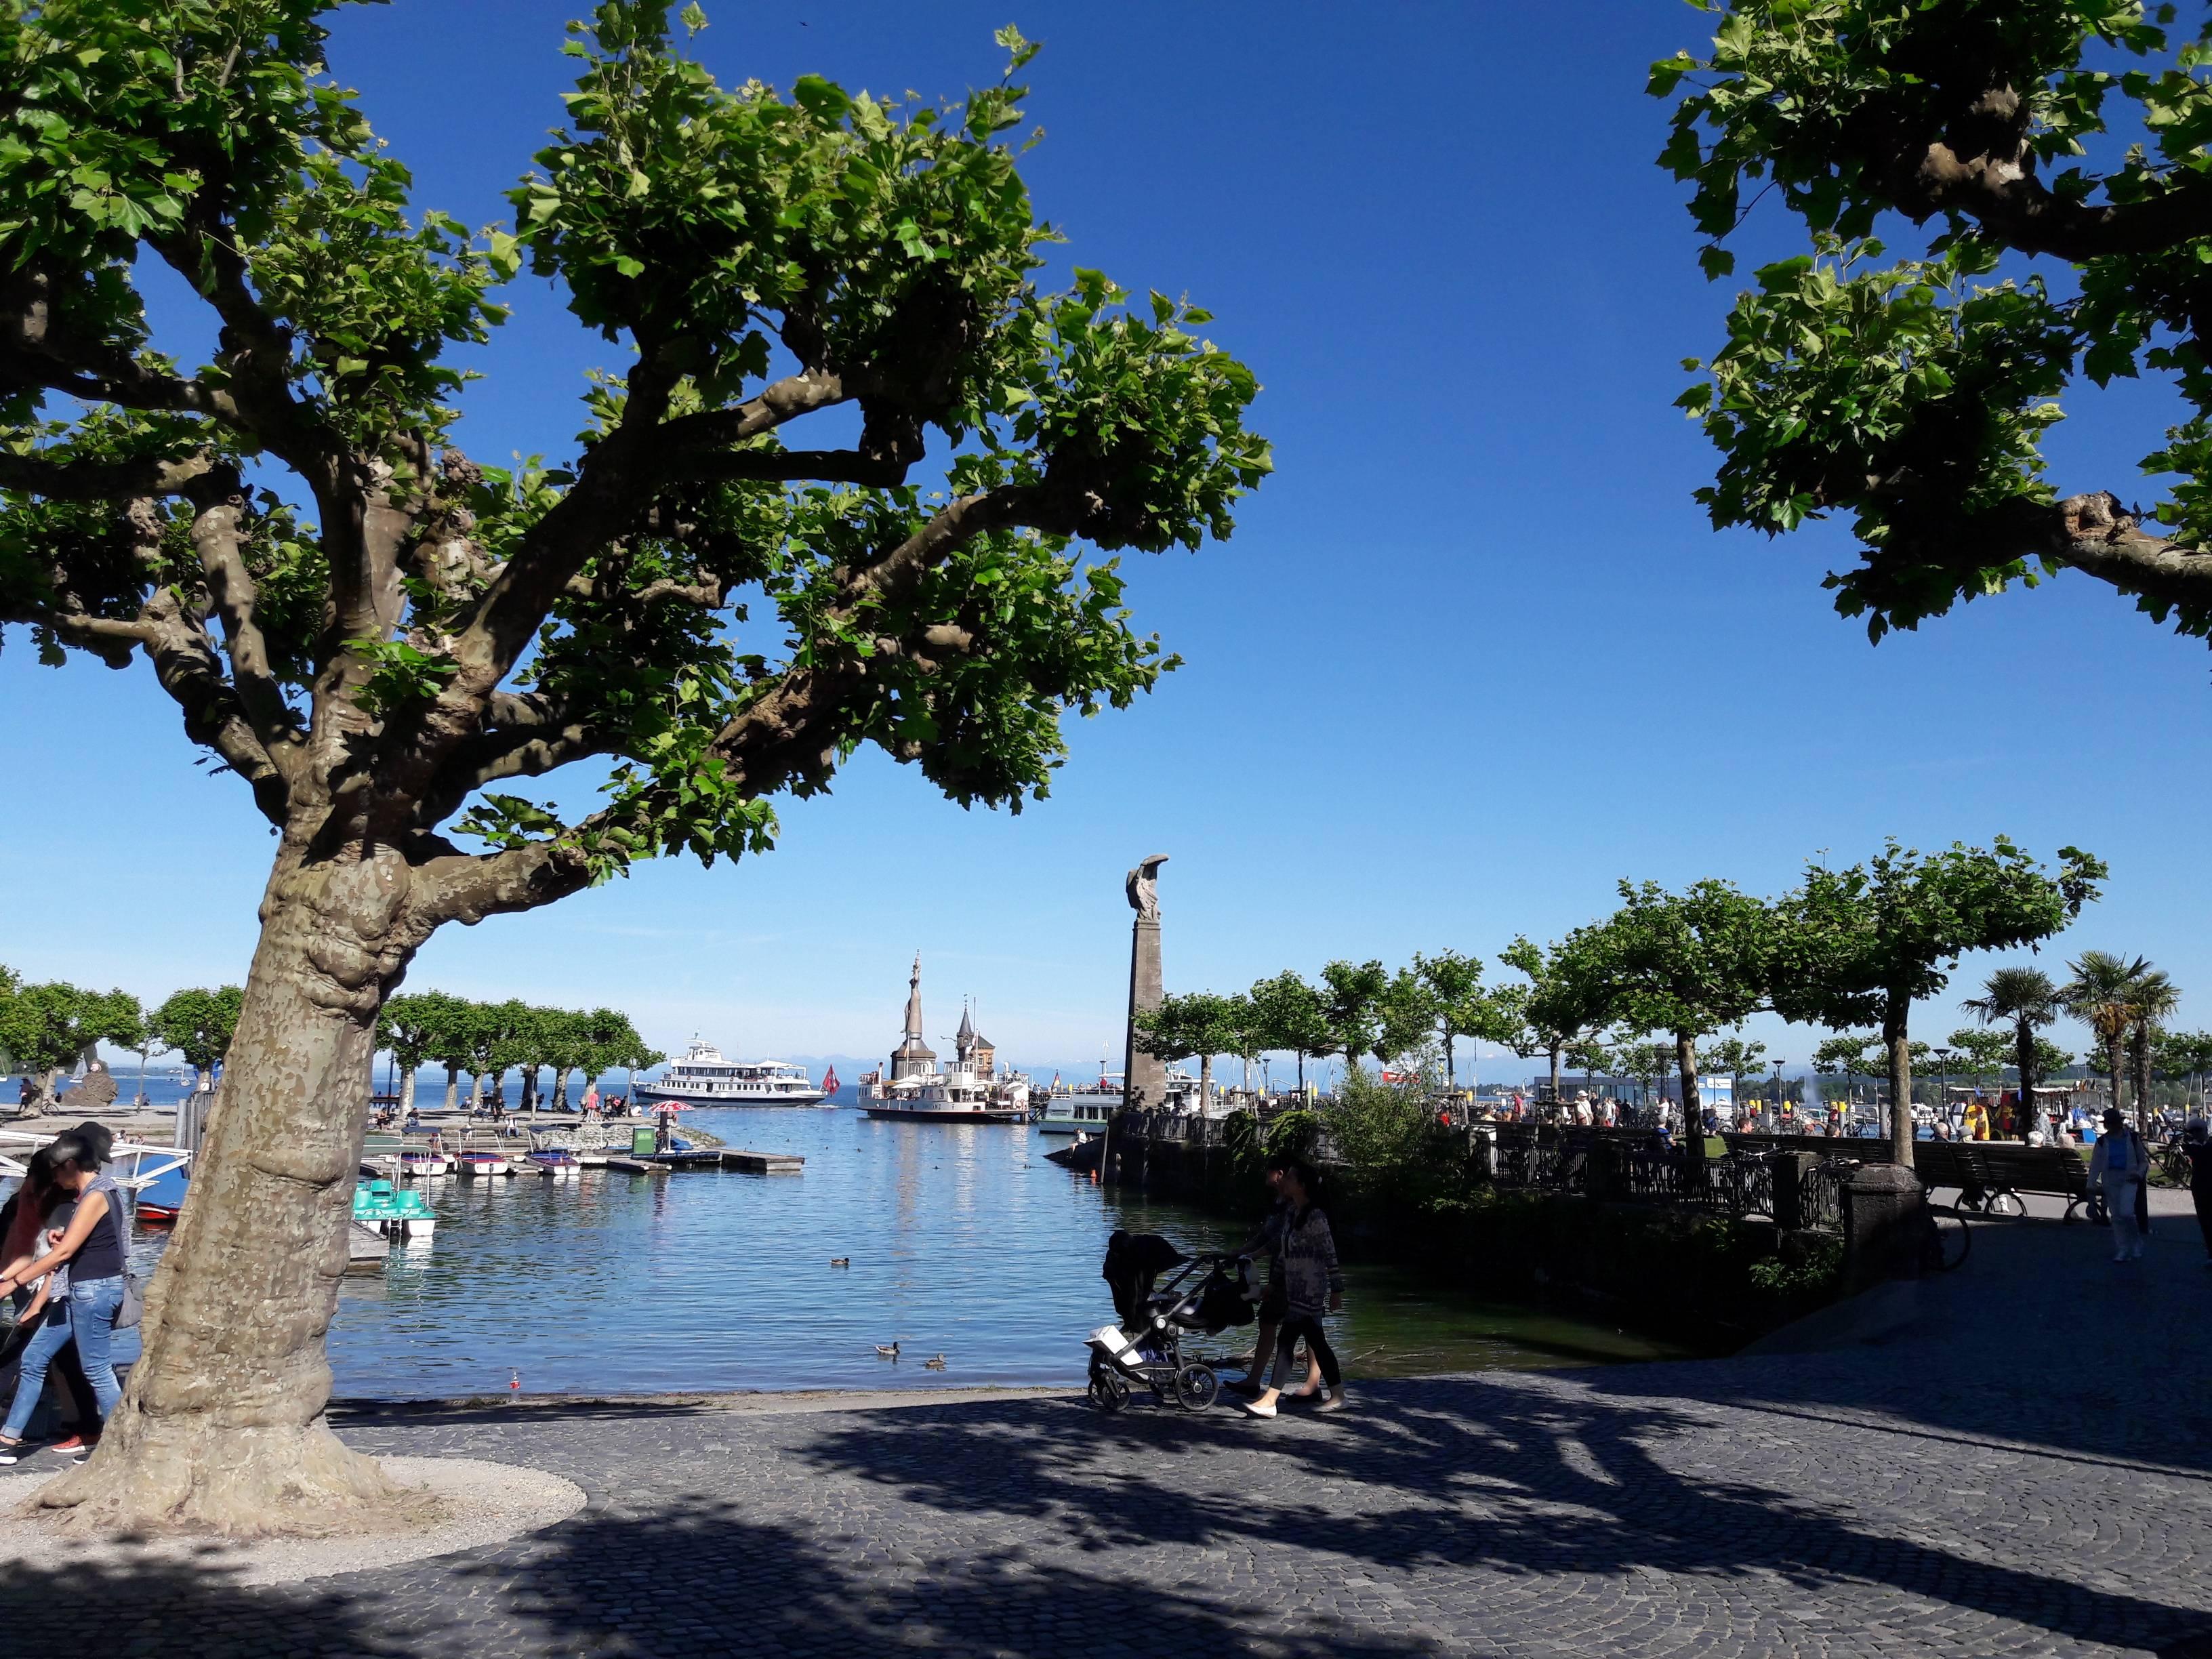 Photo 3: Rando vélo autour du Bodensee (lac de constance)